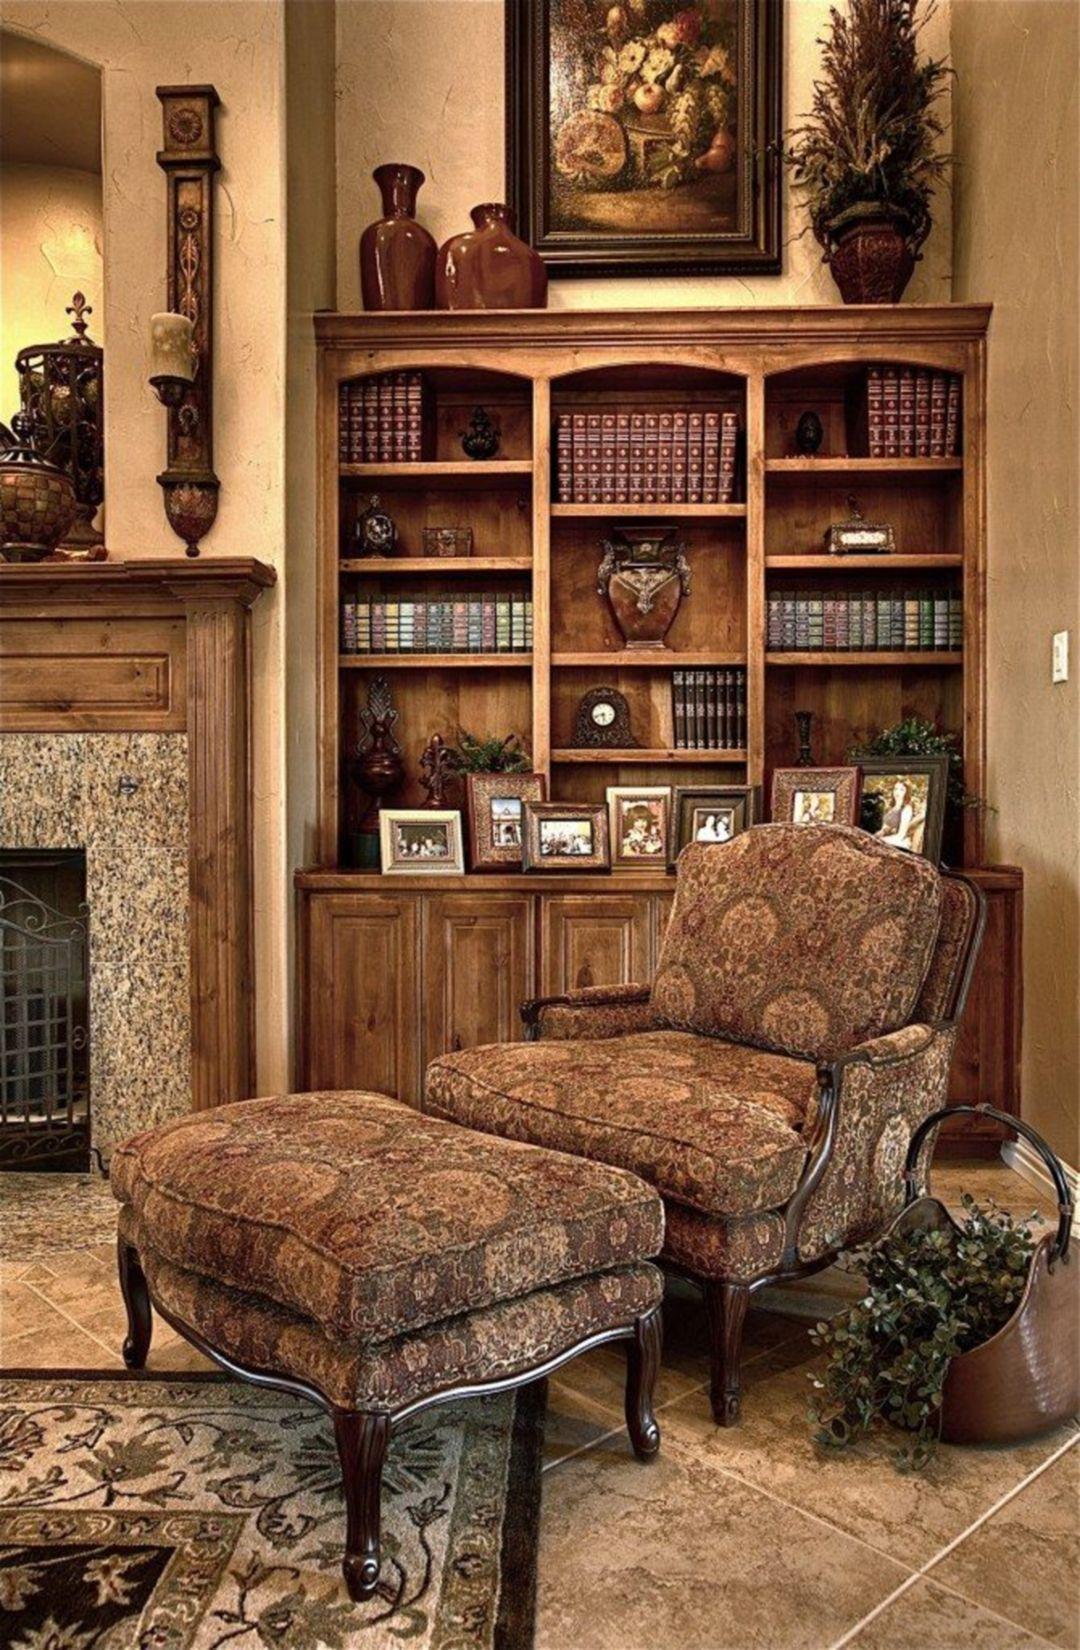 Choice Of Tuscany Living Room Decorating Ideas 015 Tuscan Living Rooms Tuscany Decor Minimalist Living Room Decor #tuscany #living #room #ideas